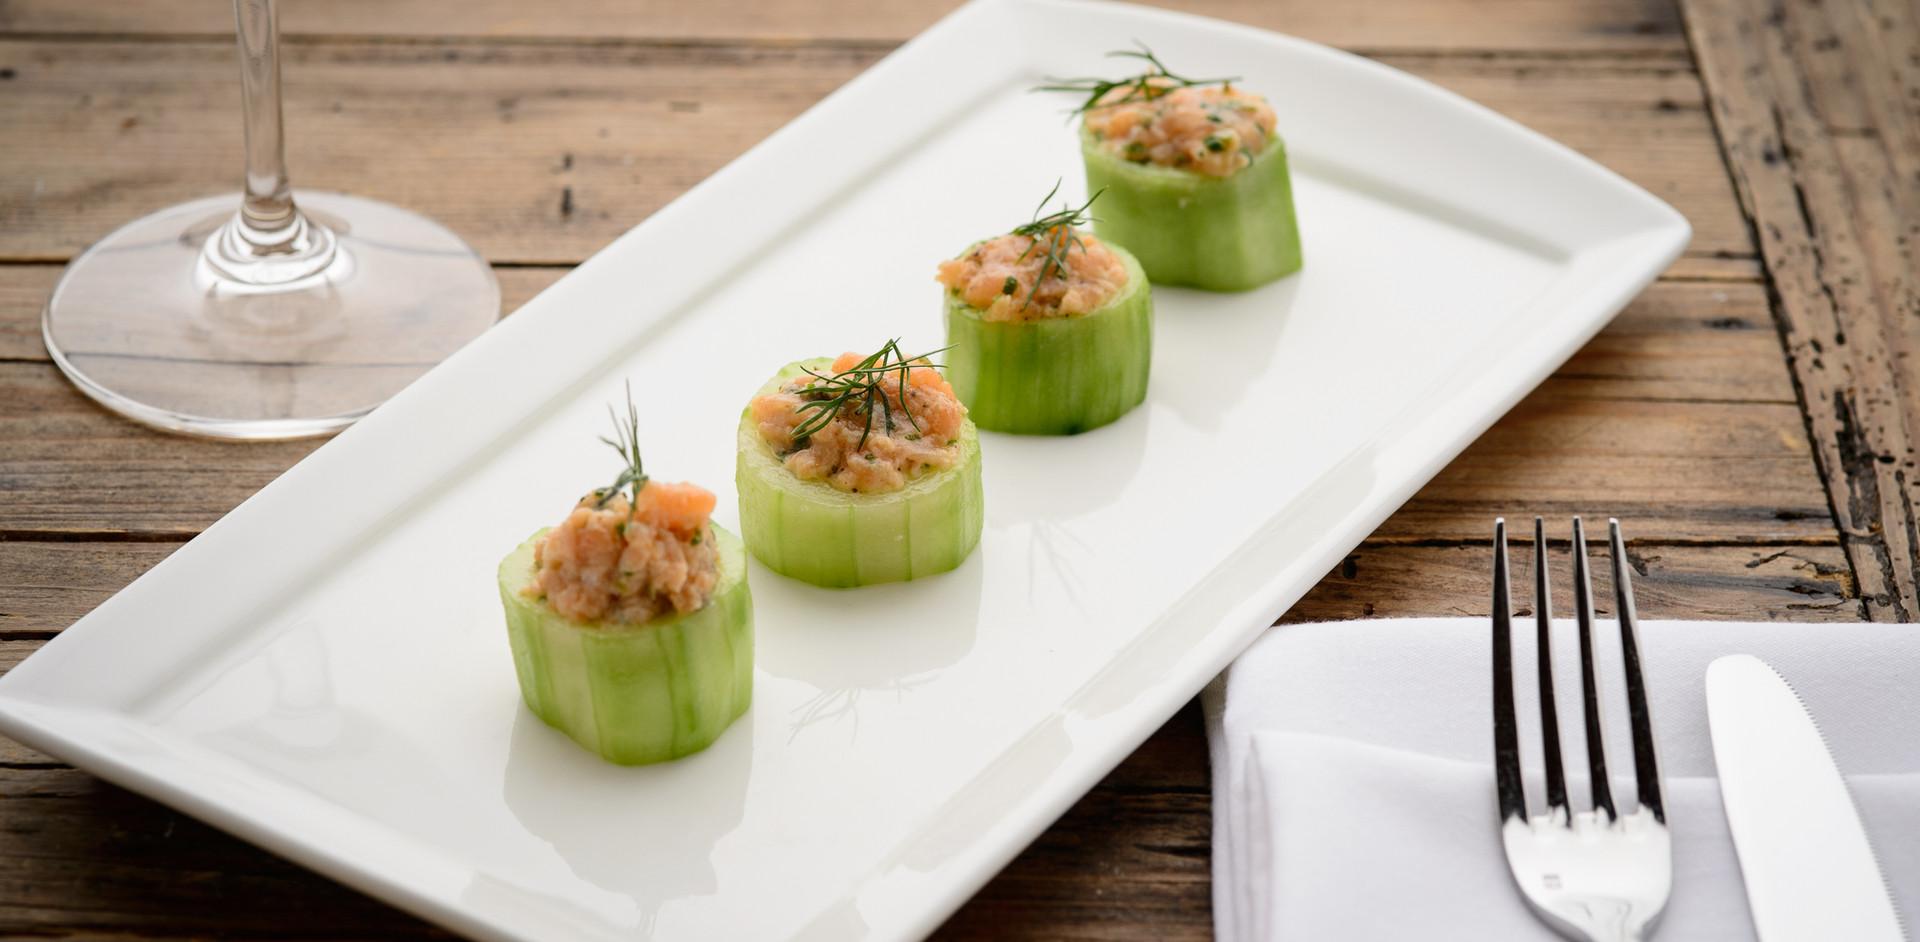 Salmon Tartare in Cucumber Cups